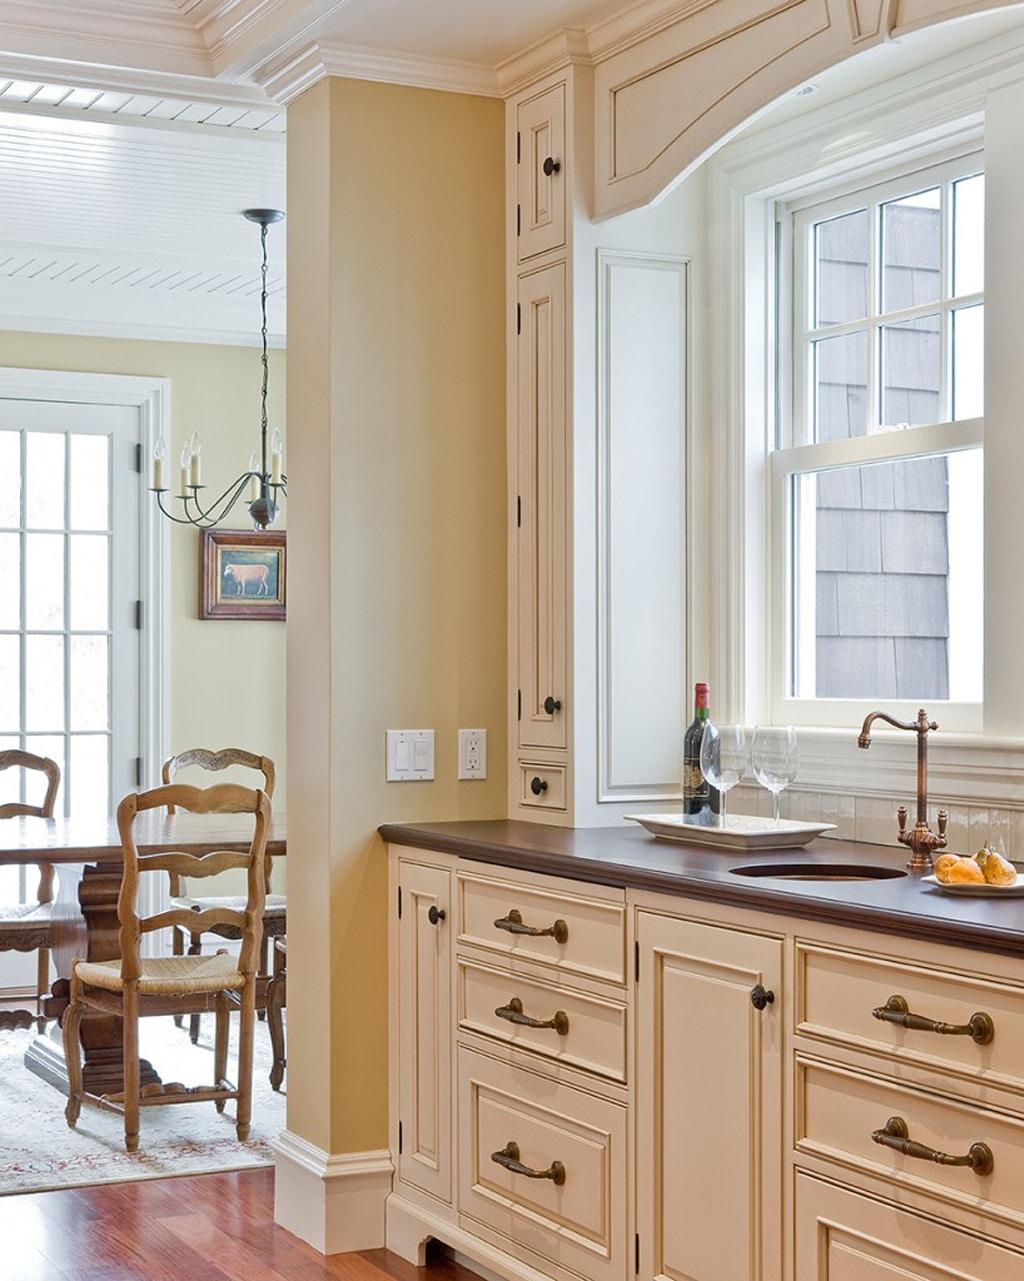 Antique White Sw 6119 On Kitchen Cabinets Rugh Design